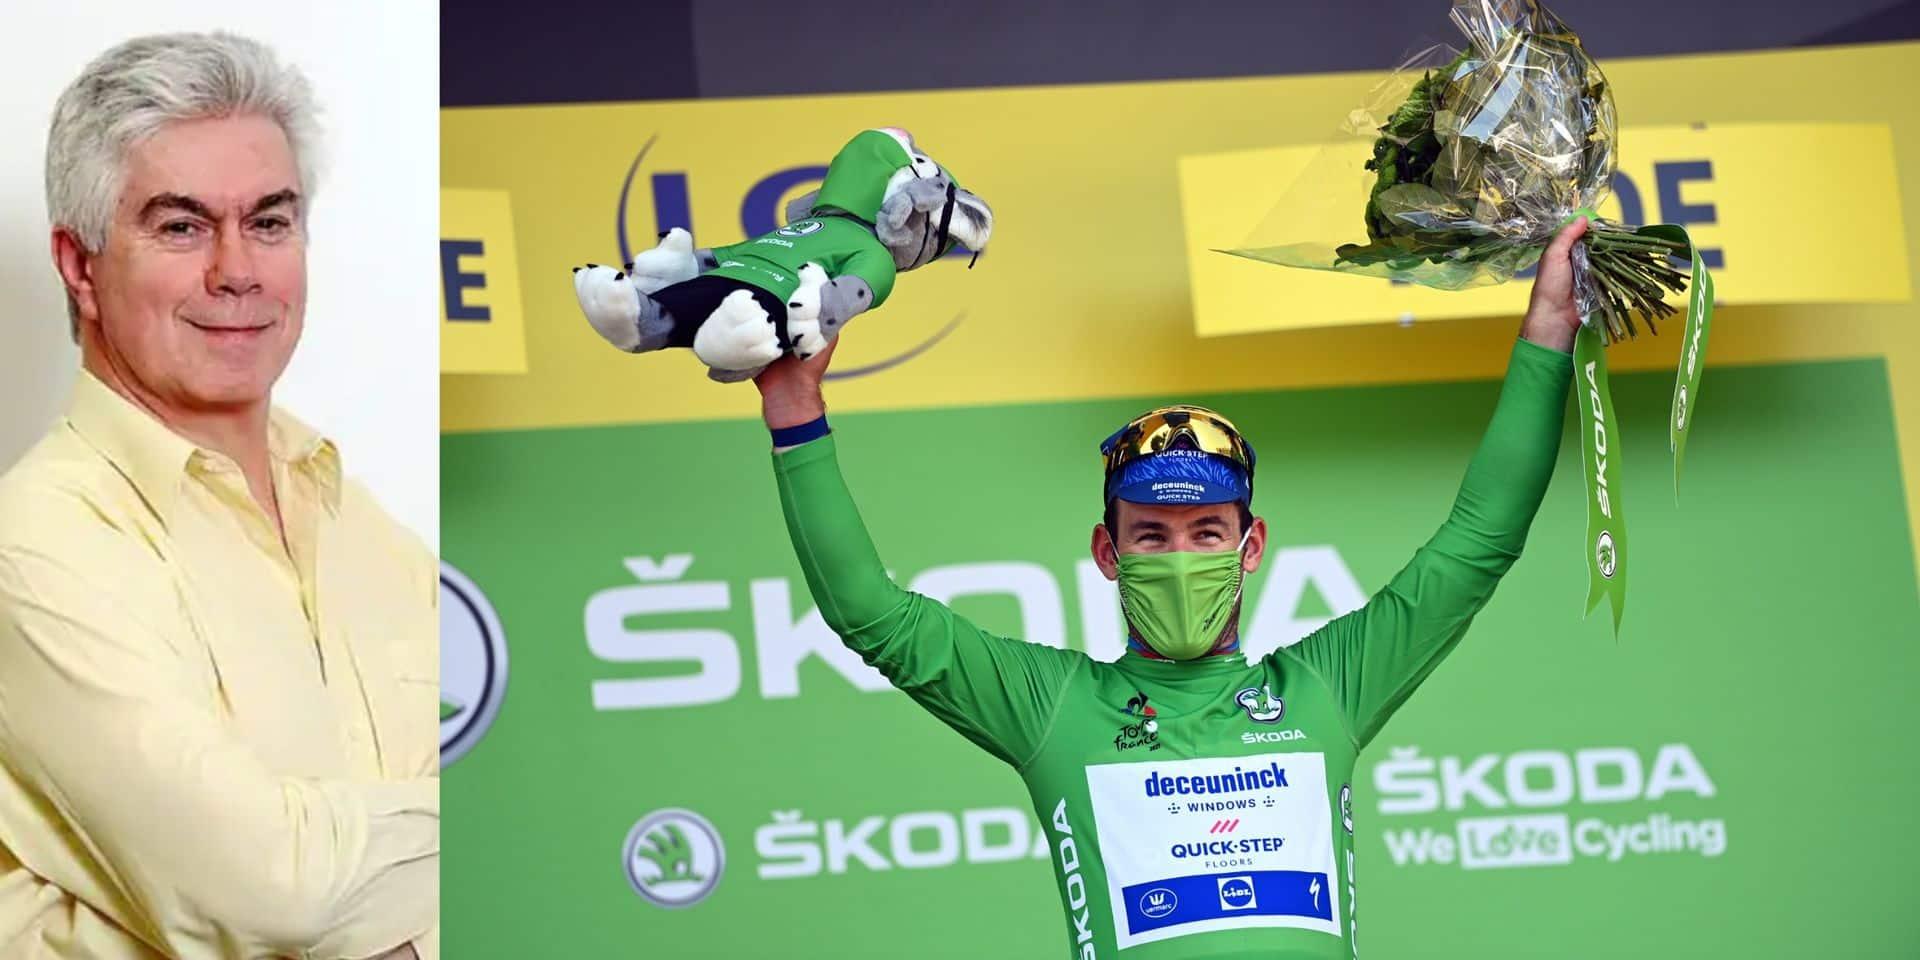 L'Edito: Mark Cavendish, le plus grand sprinter de tous les temps